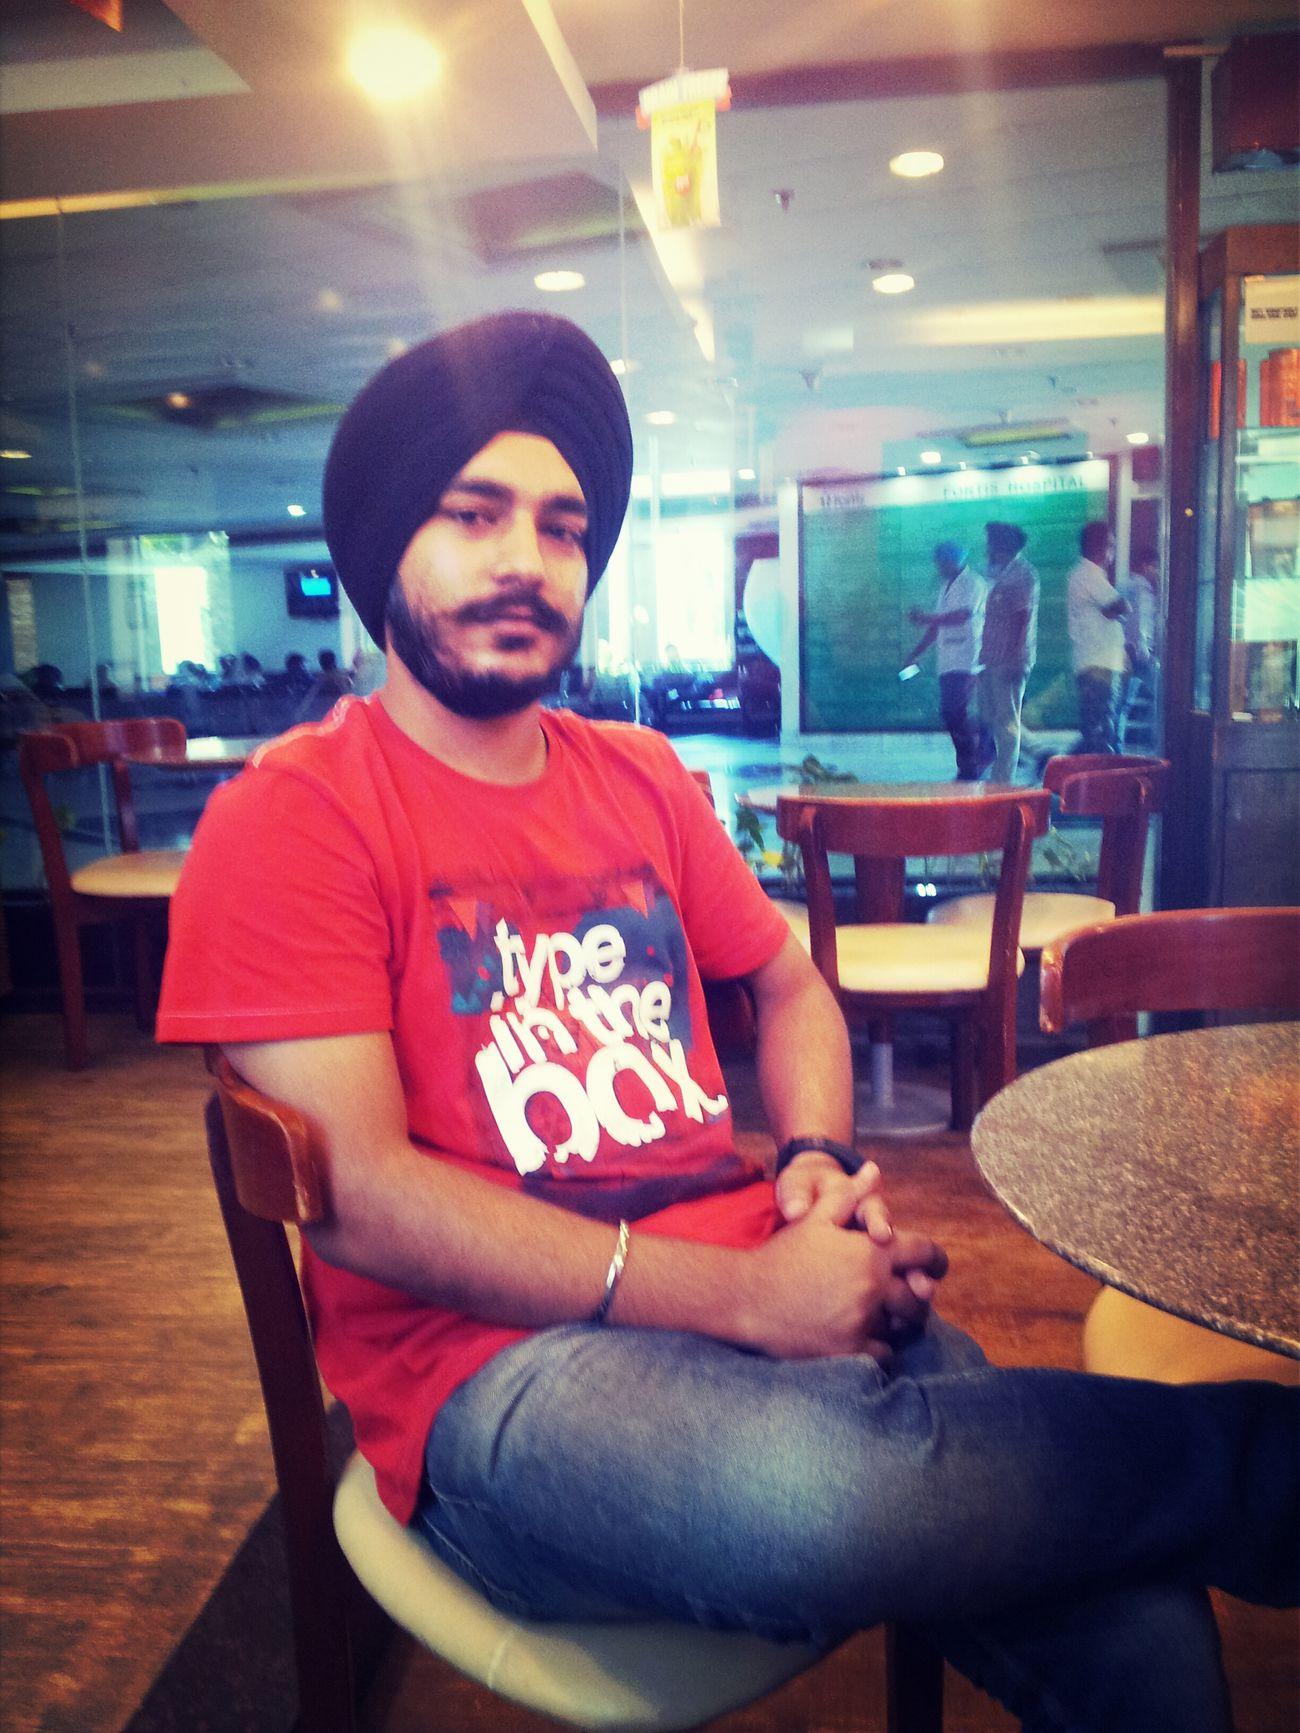 Ccd First Eyeem Photo Coffeeshop Enjoying A Meal